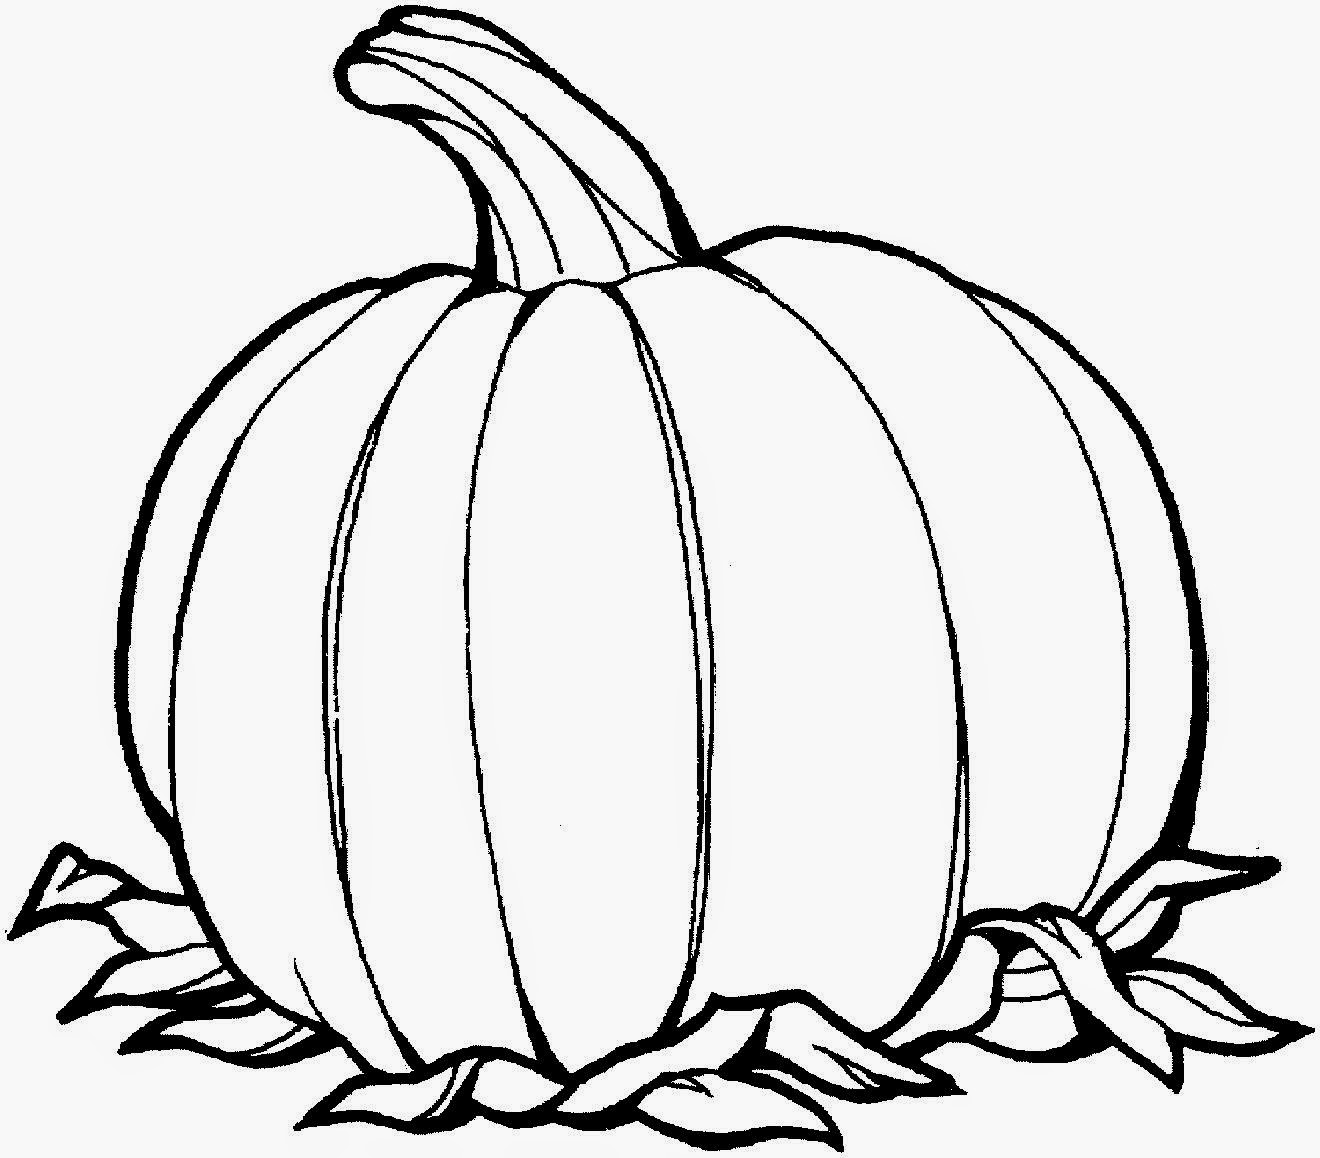 Pumpkin coloring sheet free coloring sheet for Free printable halloween pumpkin coloring pages